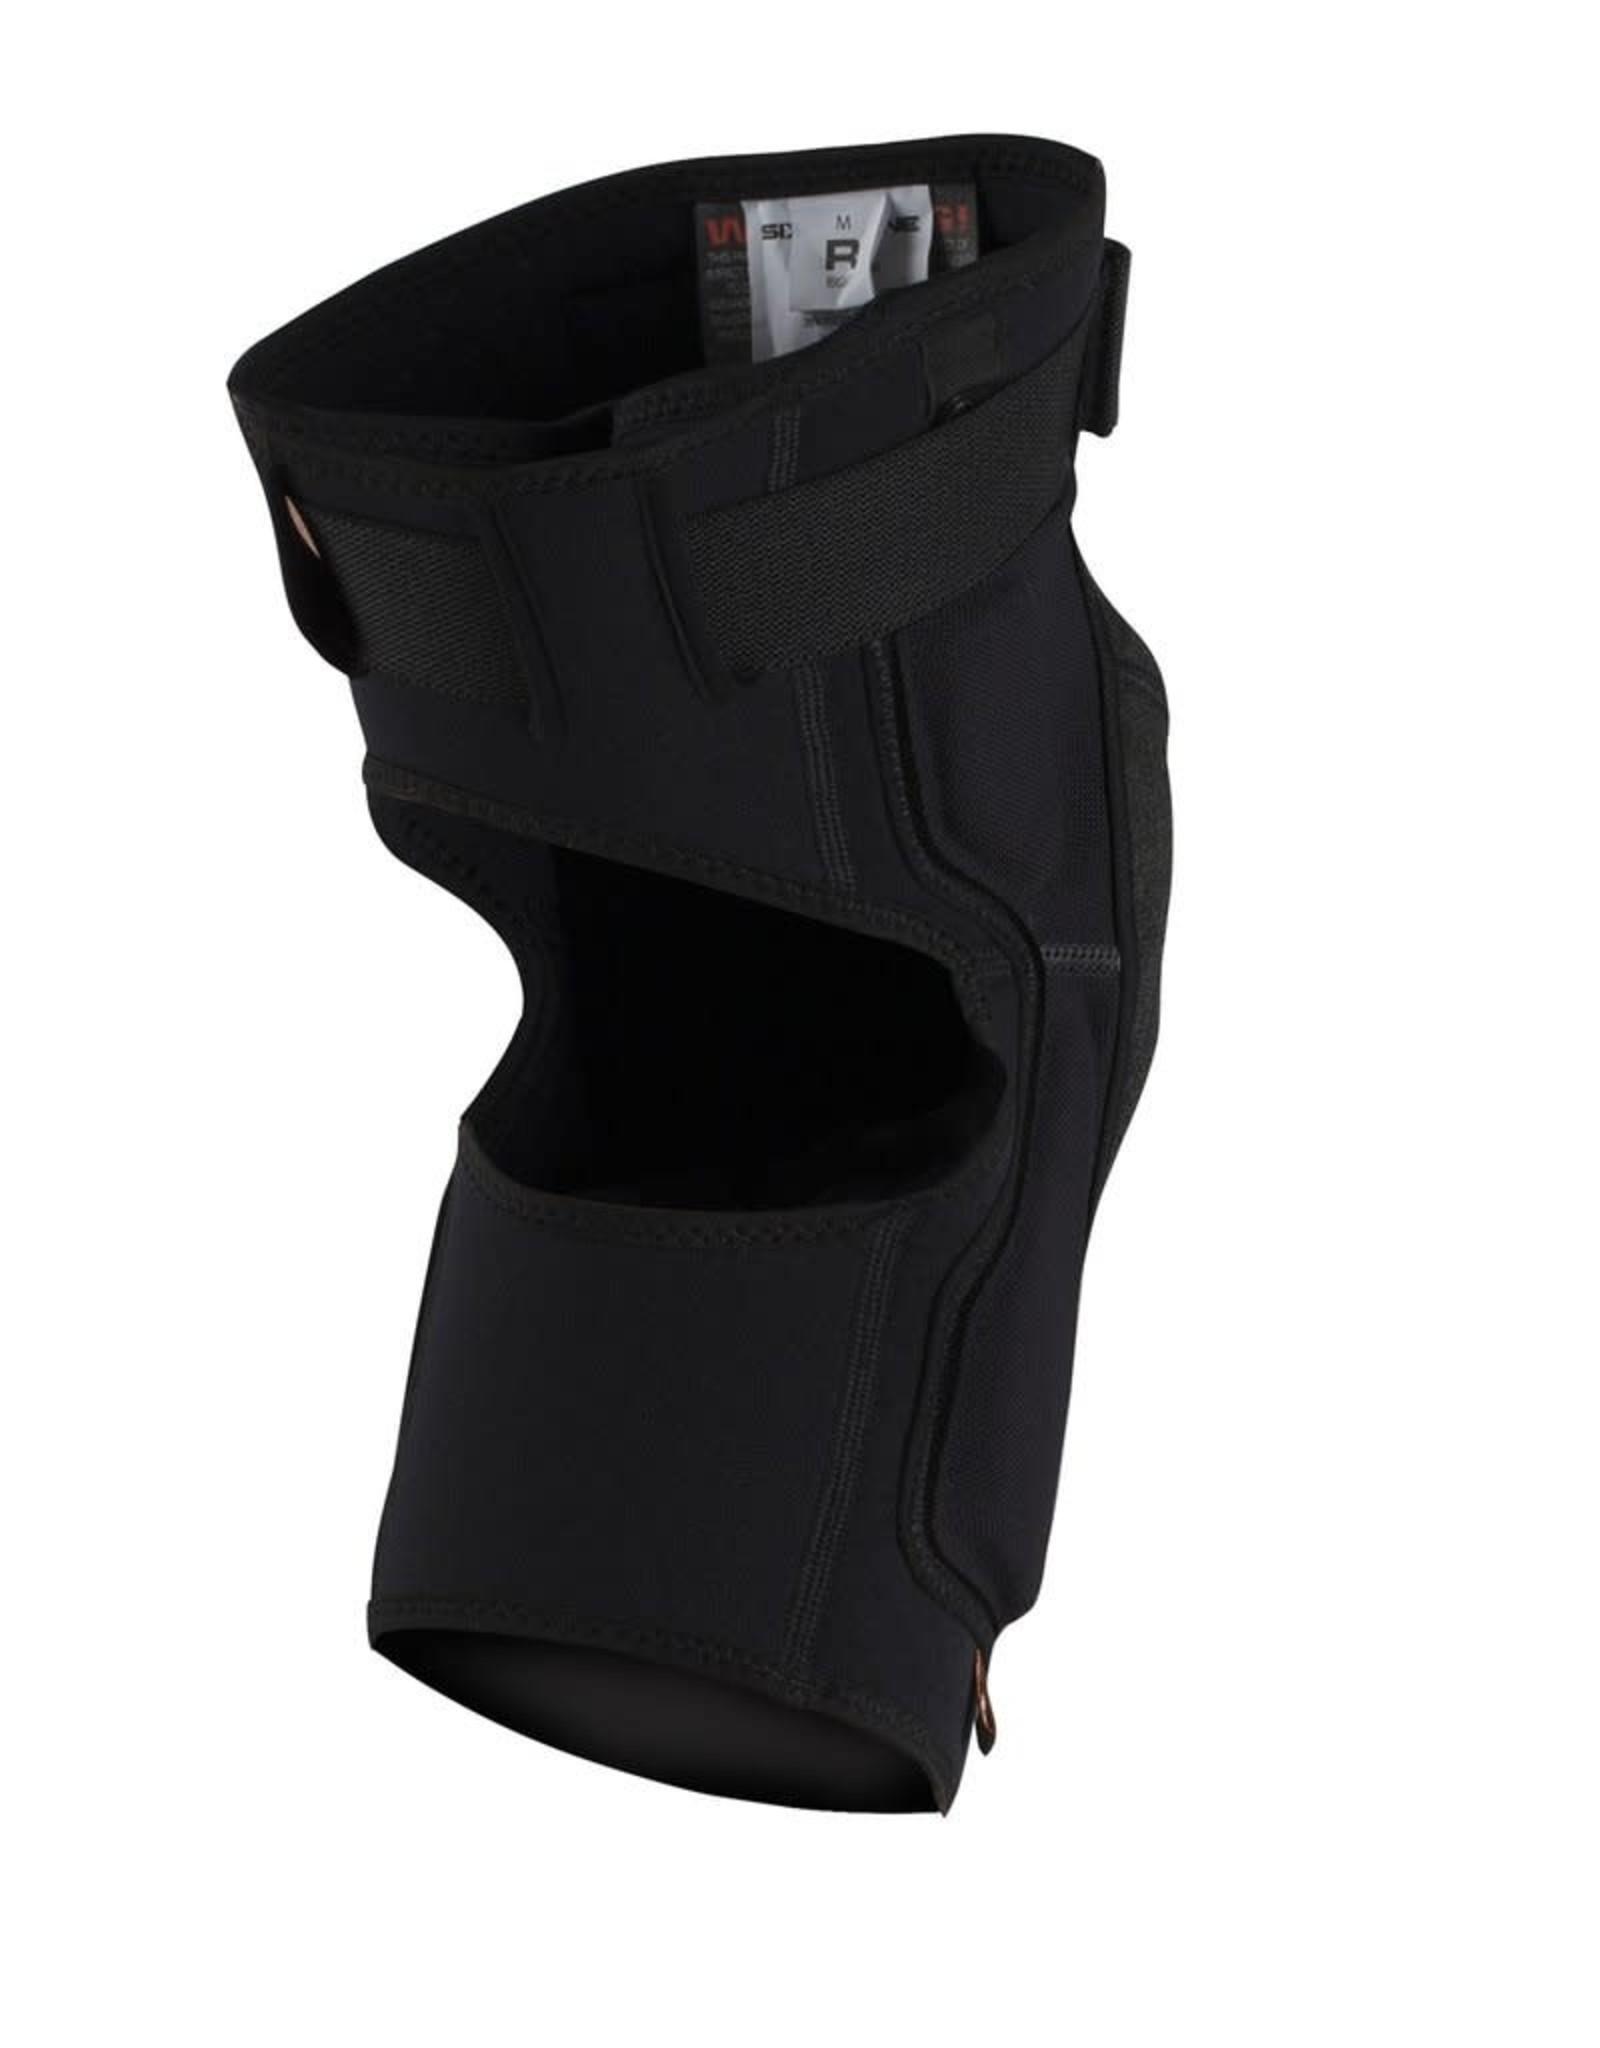 SixSixOne SixSixOne DBO Knee Guards, Black - L